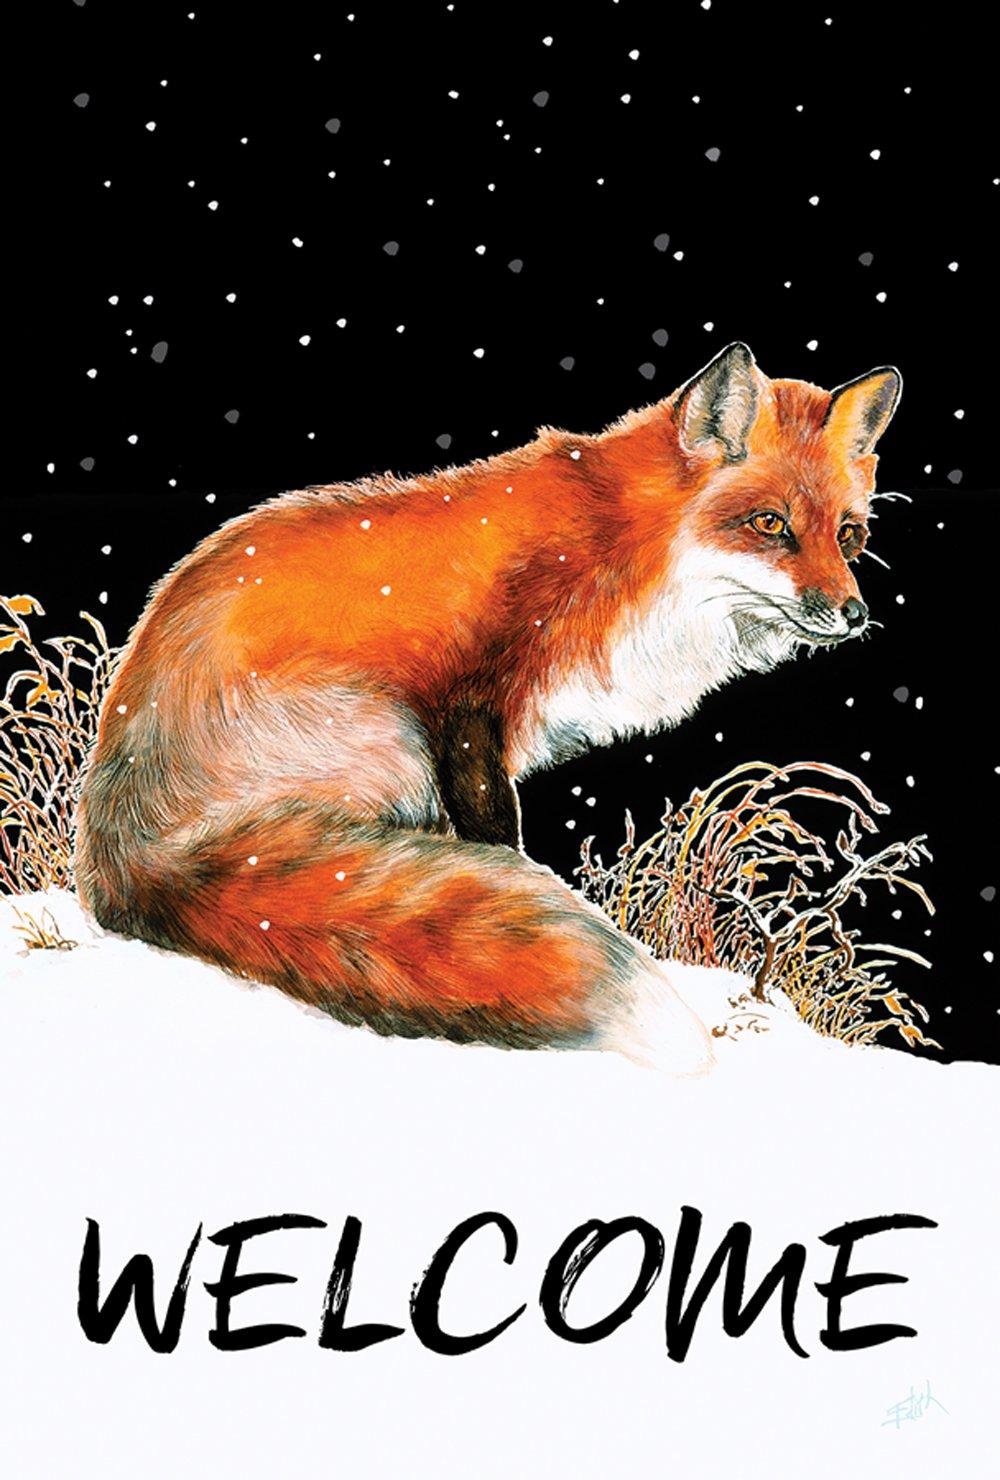 Toland Home Garden Winter Welcome Fox 28 x 40 Inch Decorative Snow Animal House Flag